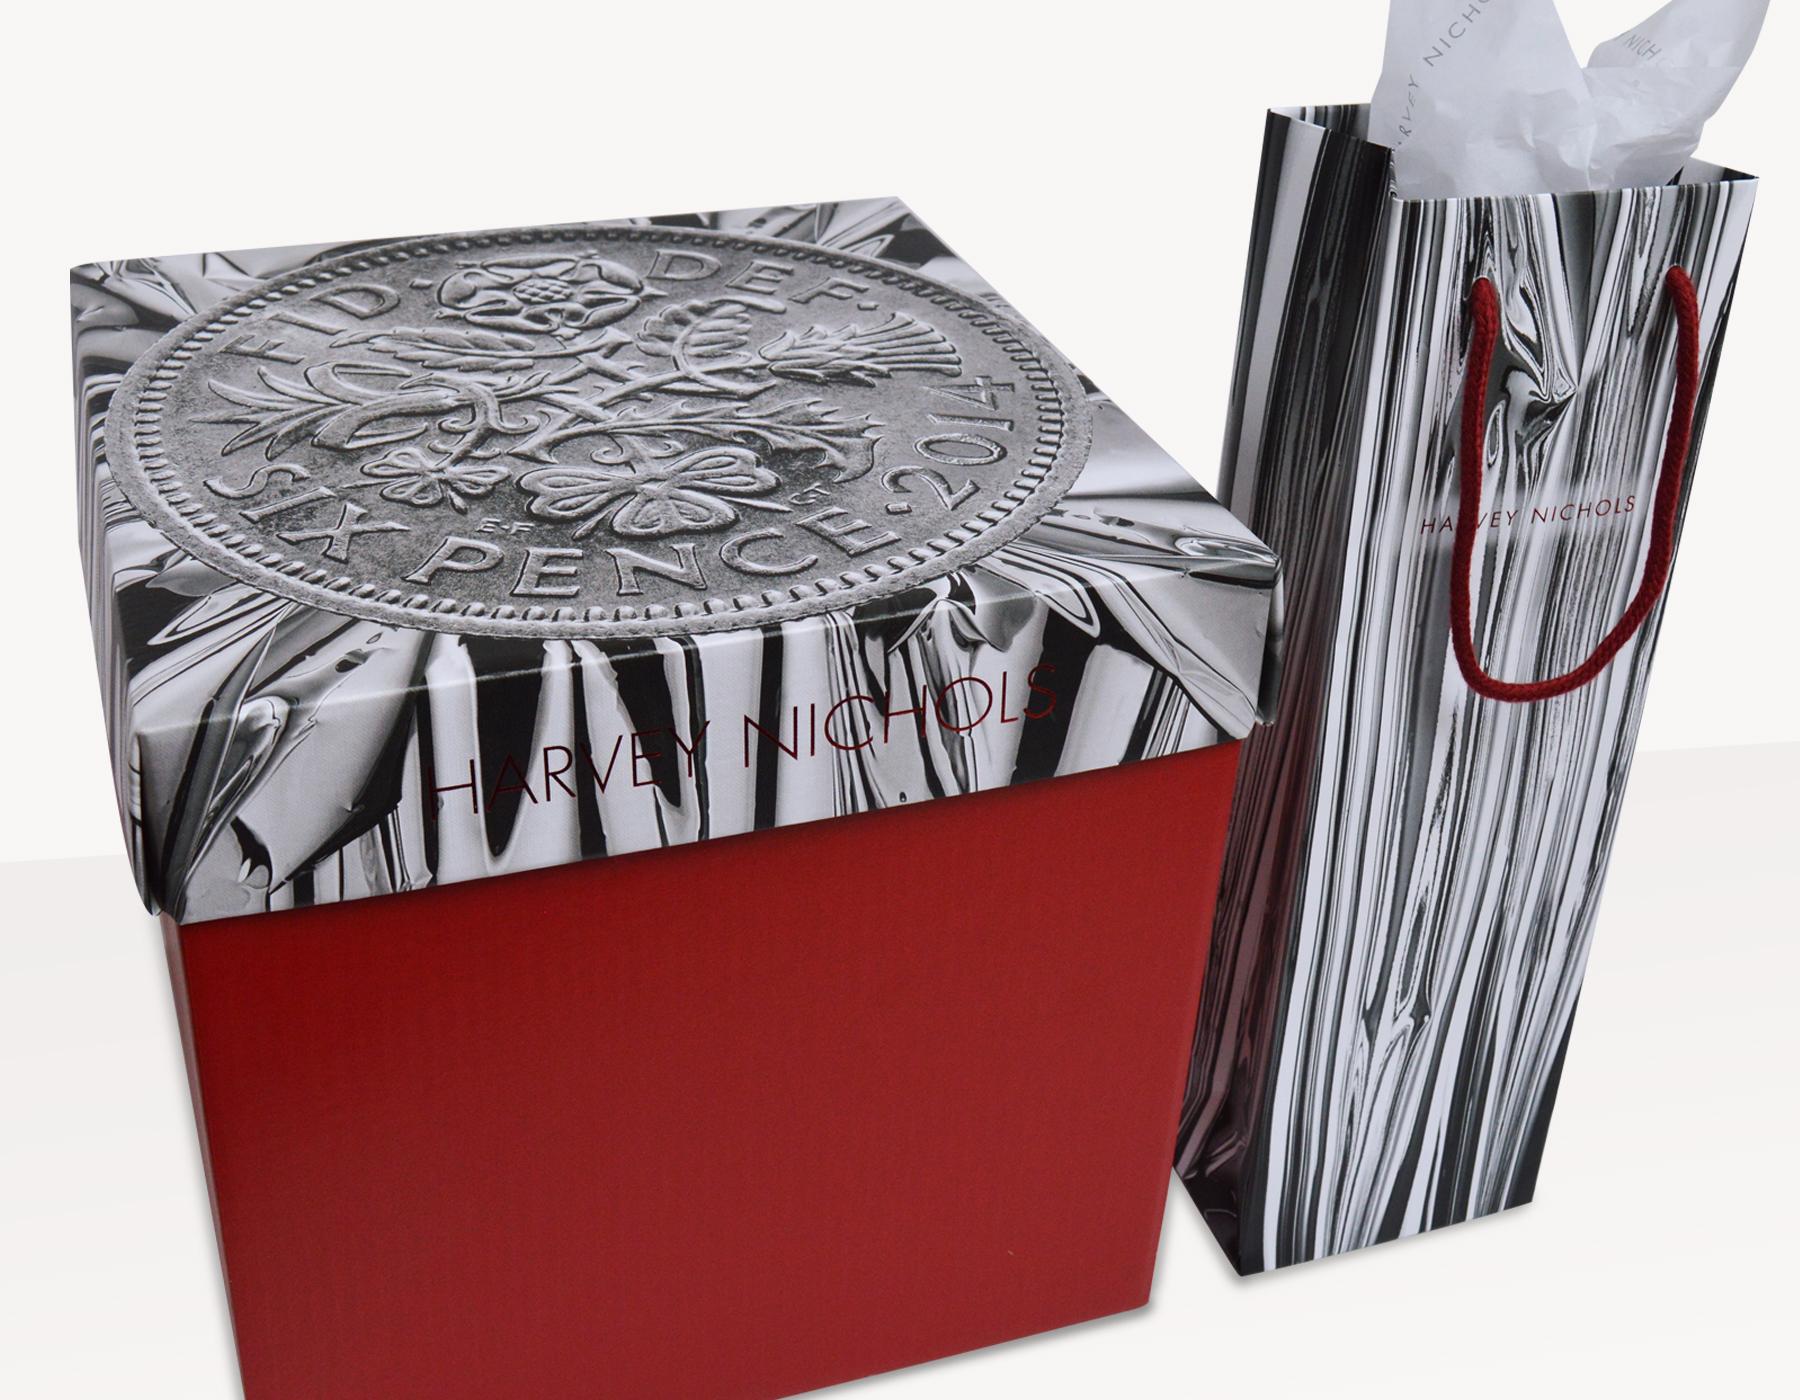 HN_Box_and_Bag.jpg